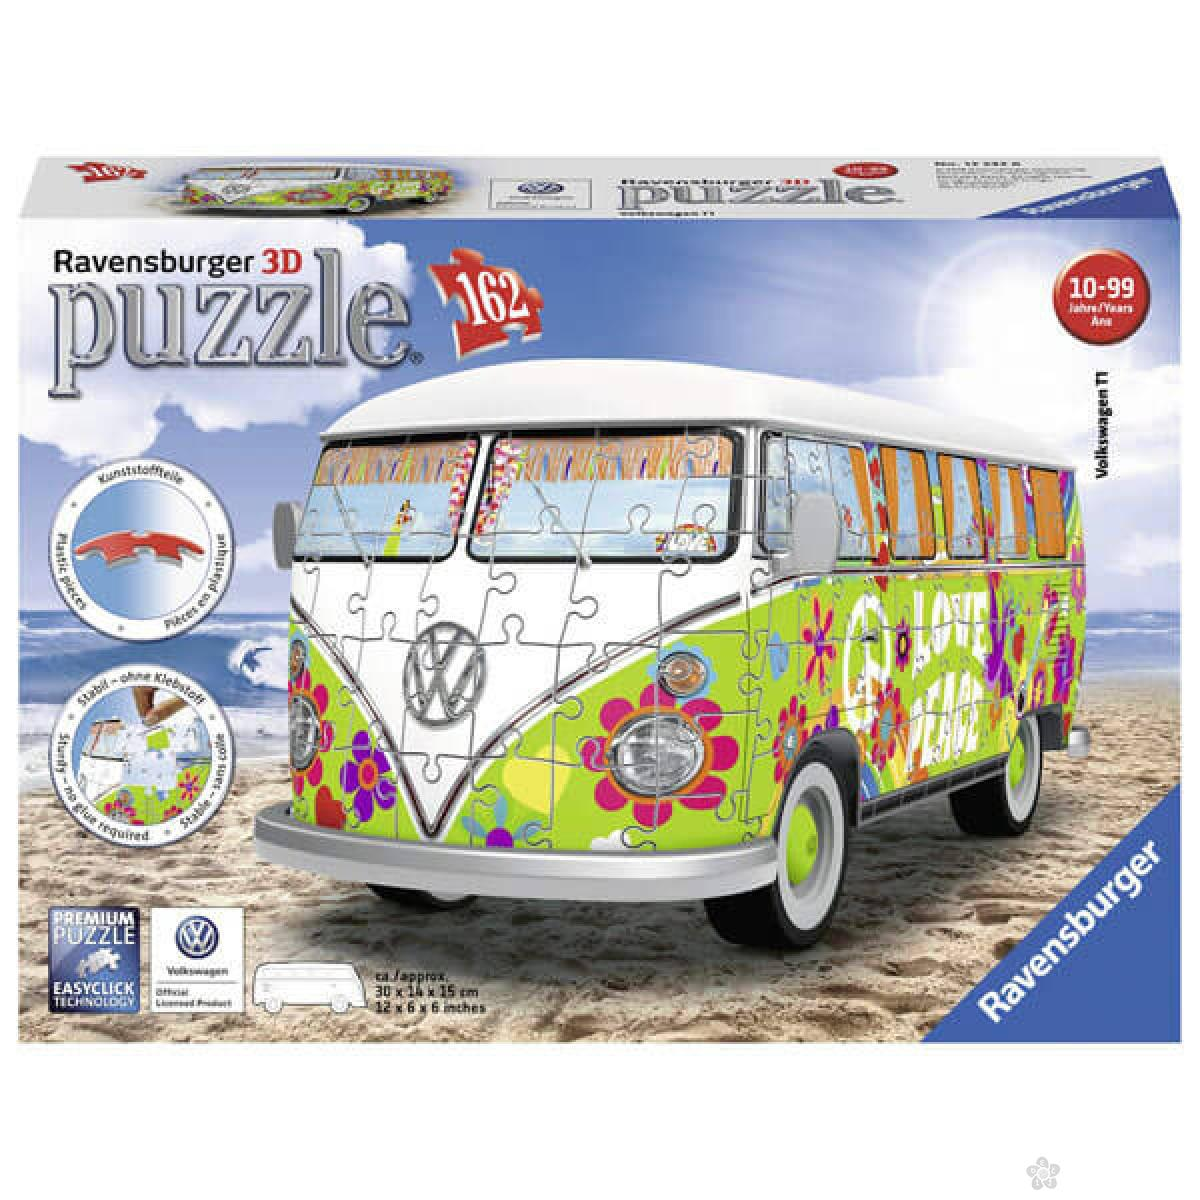 Ravensburger 3D puzzle Volkswagen kombi hipi stil RA12532